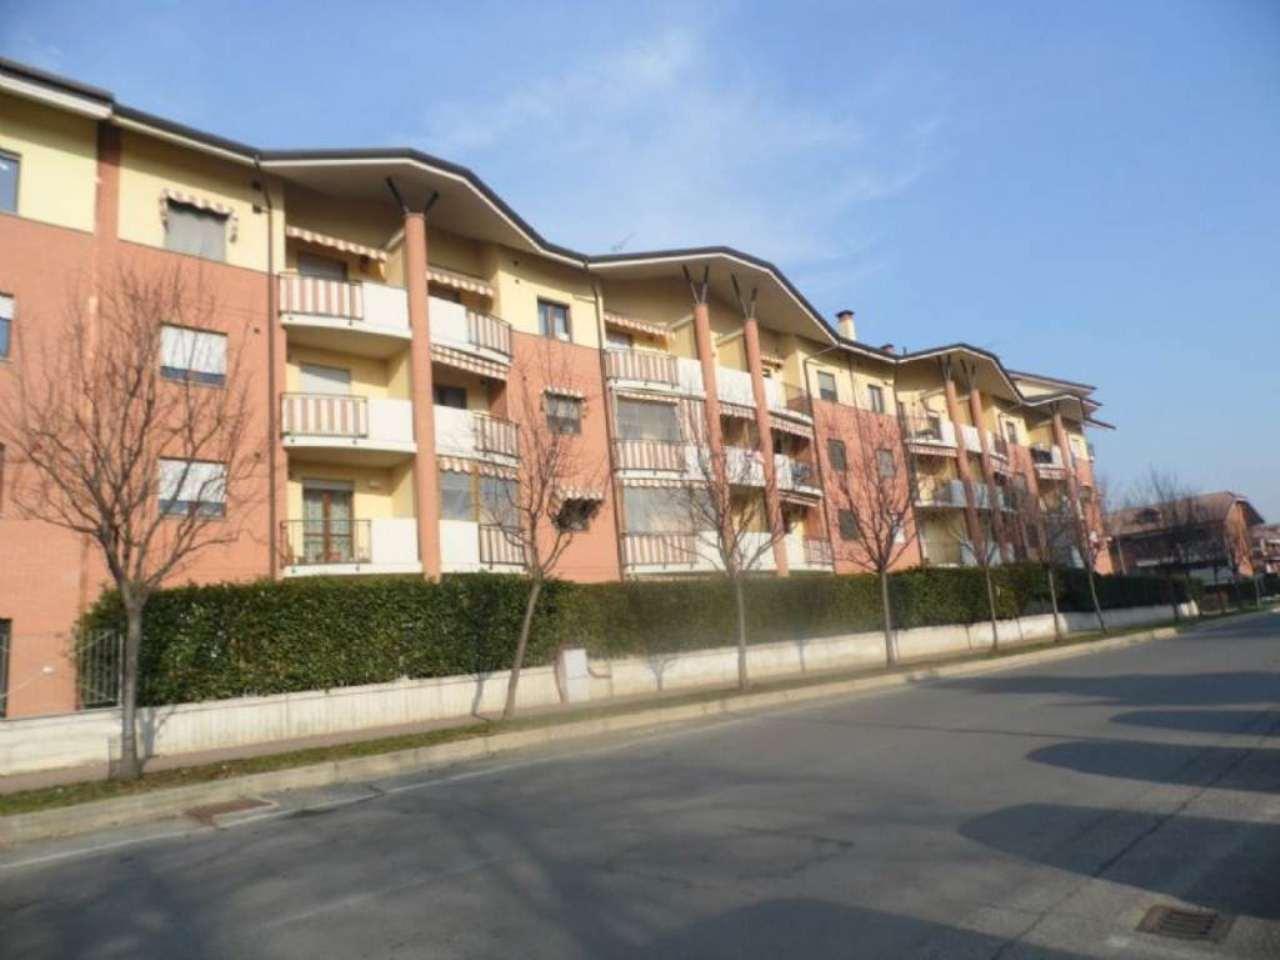 Bilocale Borgaro Torinese Via Settimo 13